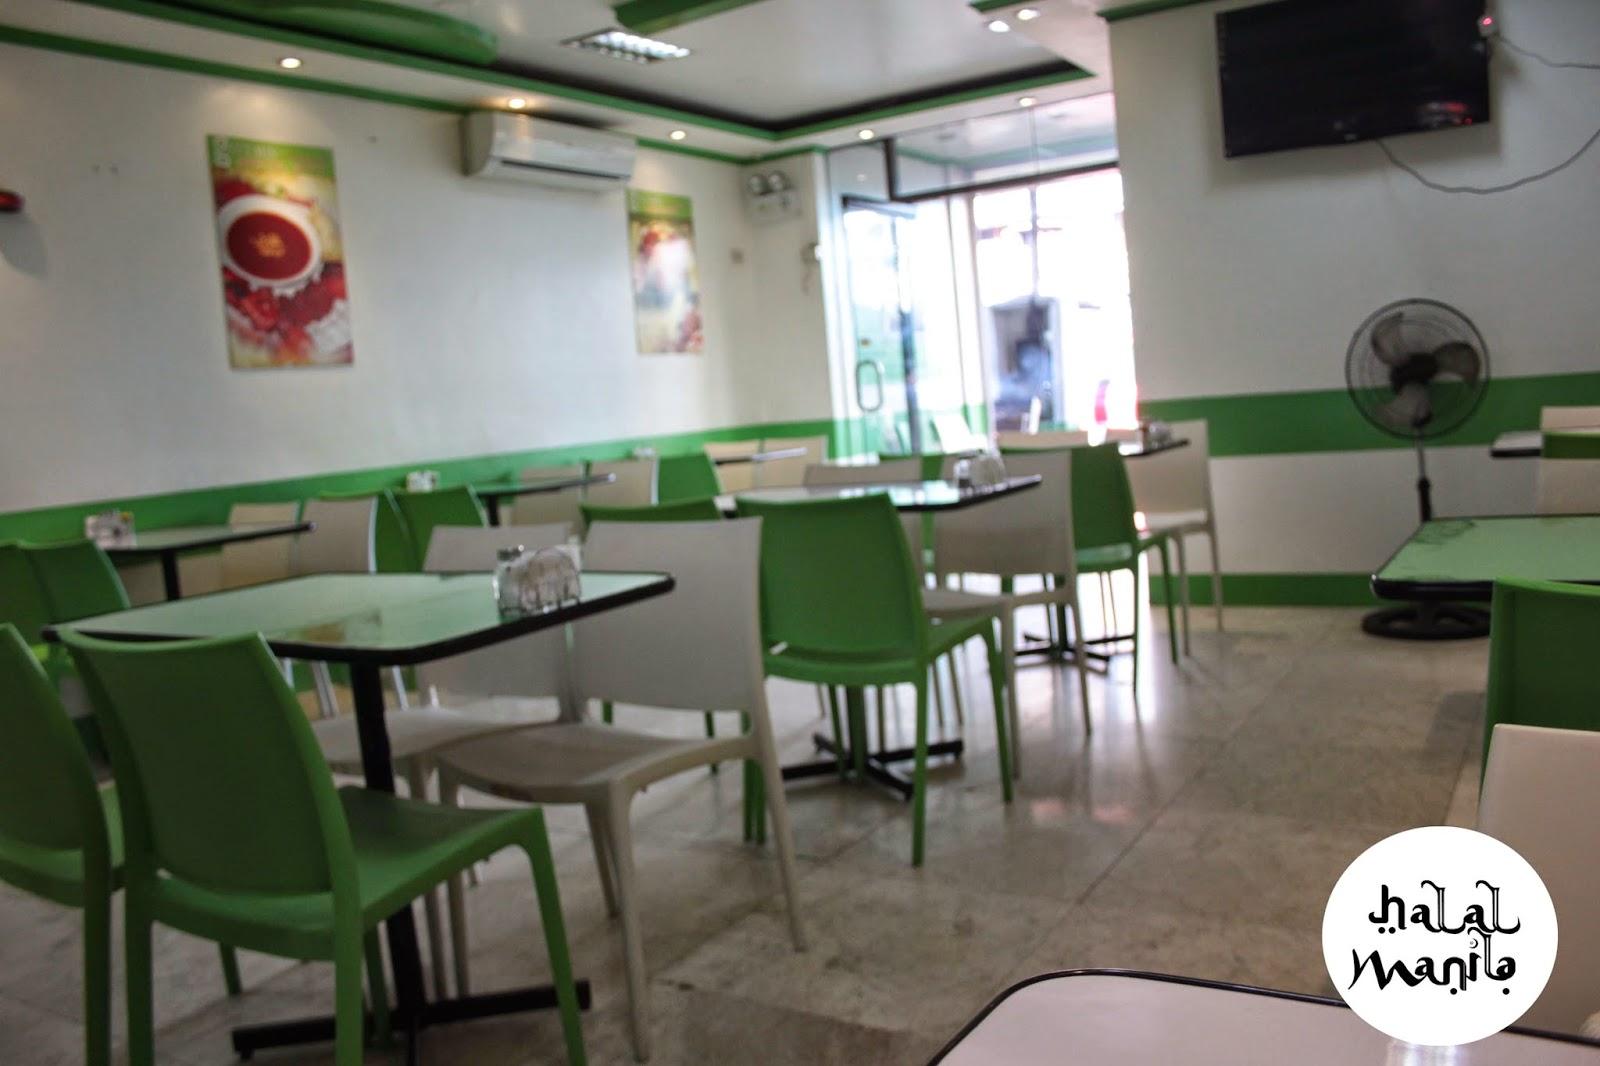 Halal Manila foods